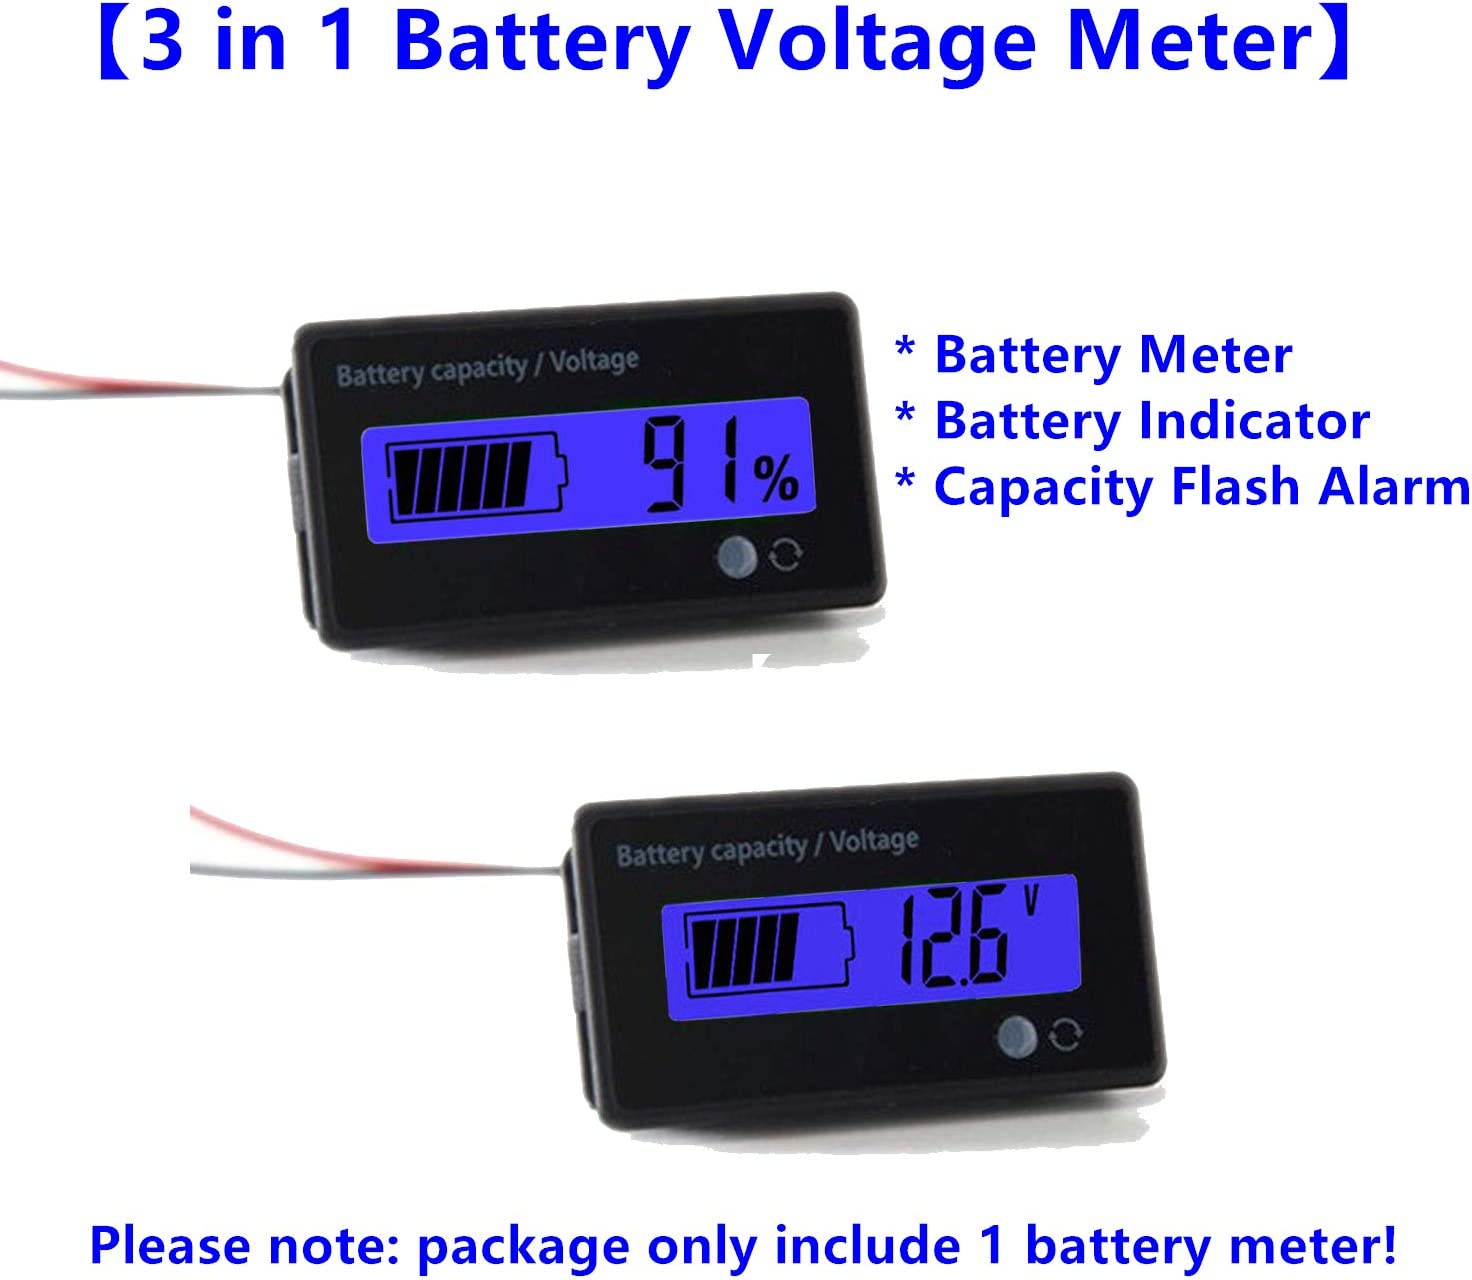 QJFCare Flash Alarm WHITE LCD Waterproof Battery Capacity Monitor Gauge Meter,12V//24V//36V//48V Lead Acid Battery Status Indicator,Lithium Battery Capacity Tester Voltage Meter Monitor